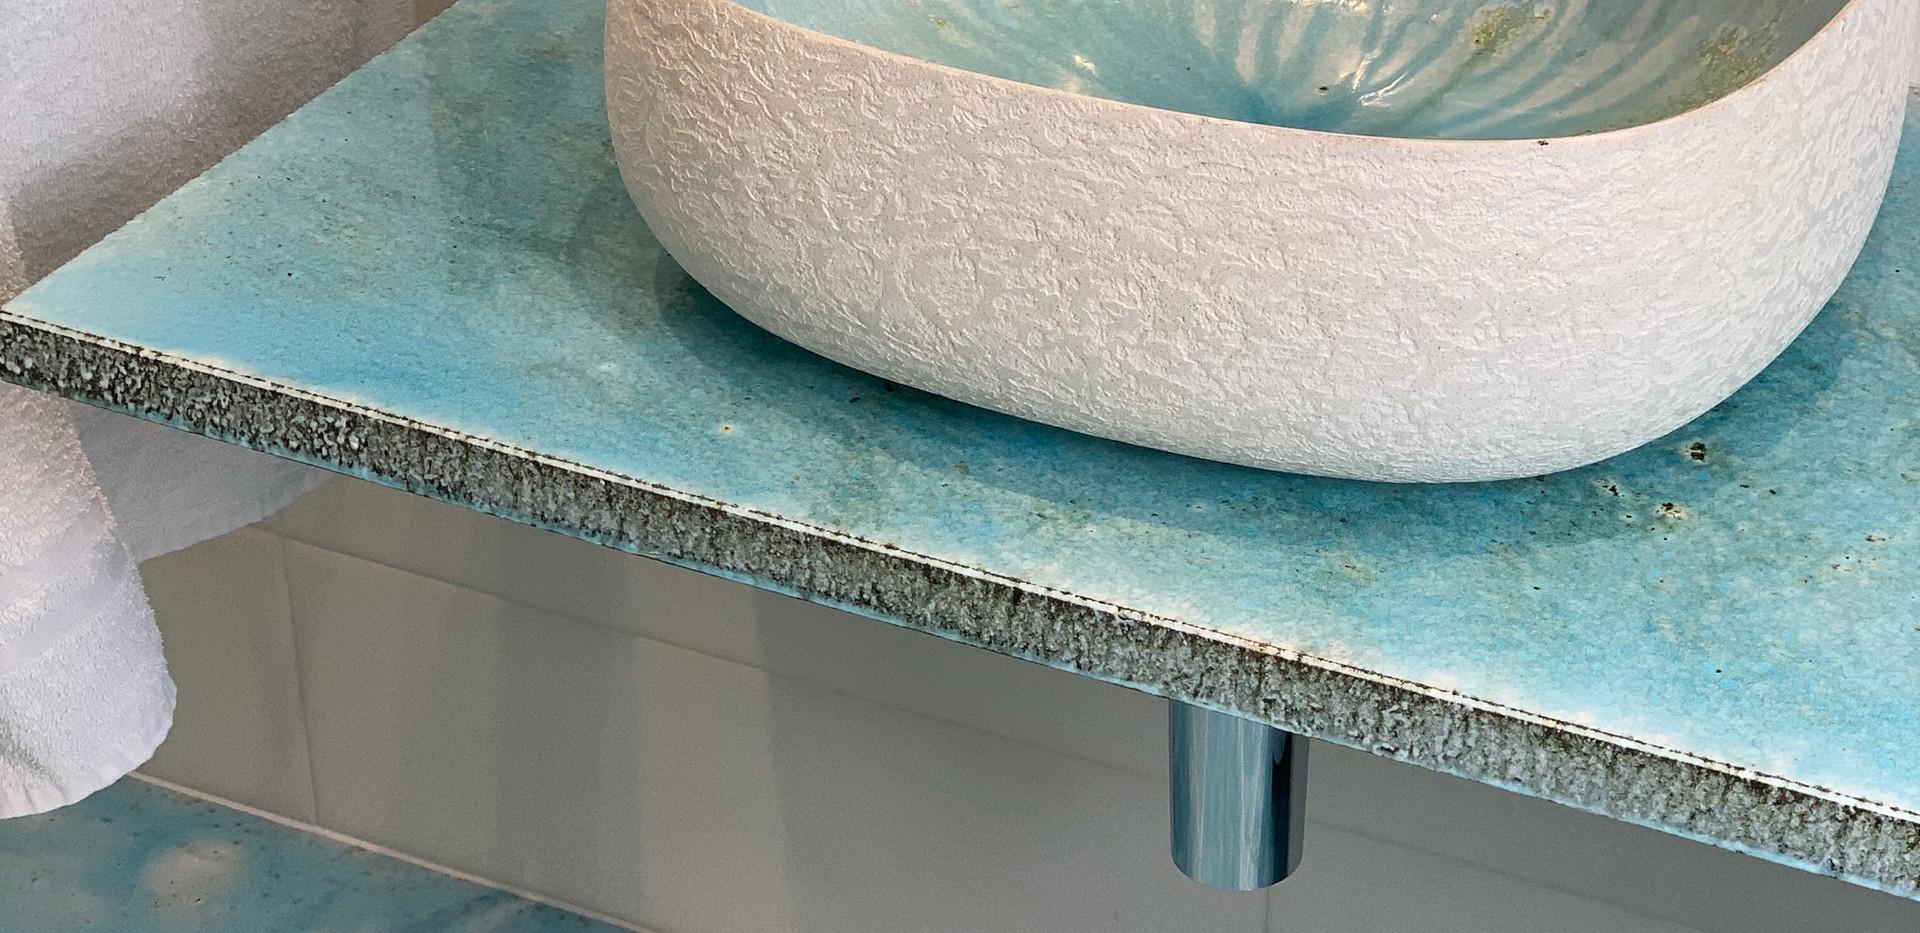 Lavabo Seed canaletto cielo interno, cemento esterno